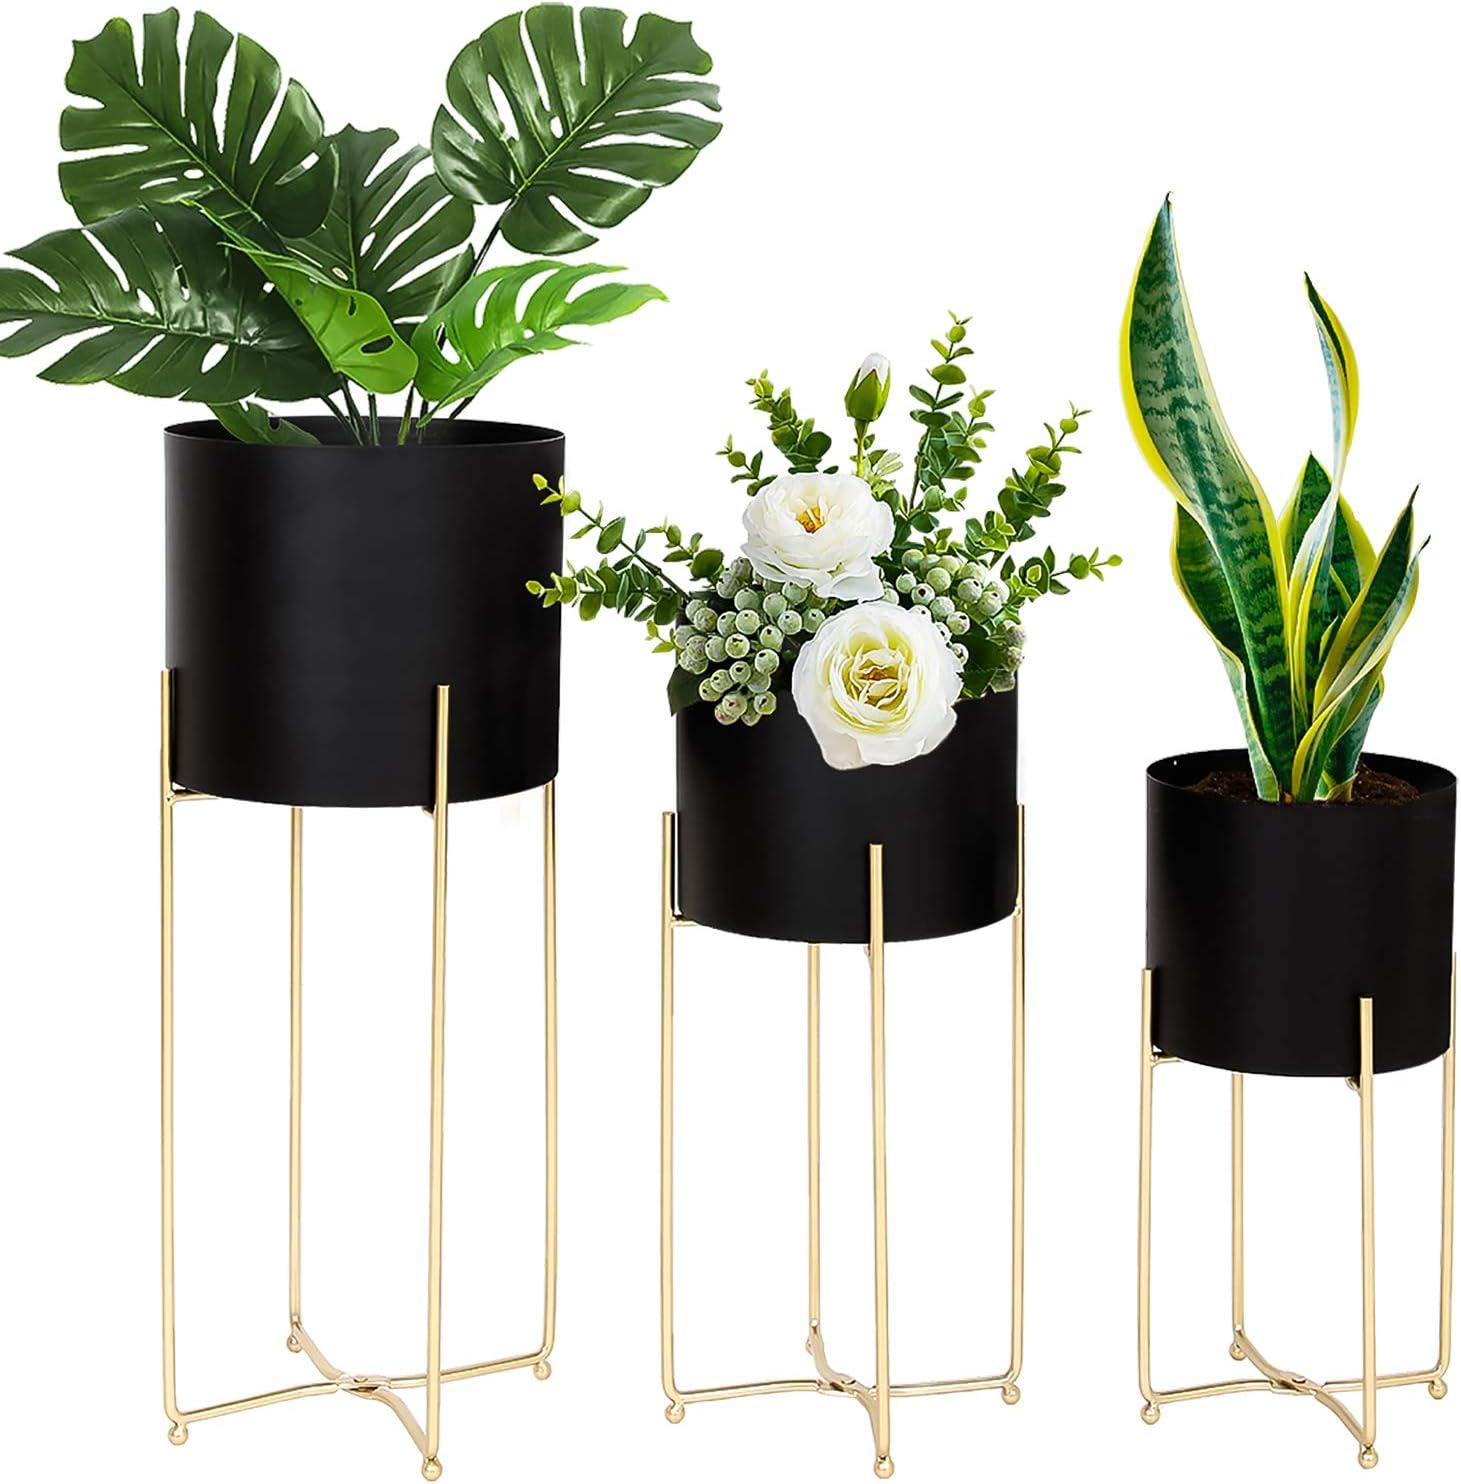 LANPU Modern Planter Stand Inexpensive with trend rank Pot Mid Century Plan Tall Black